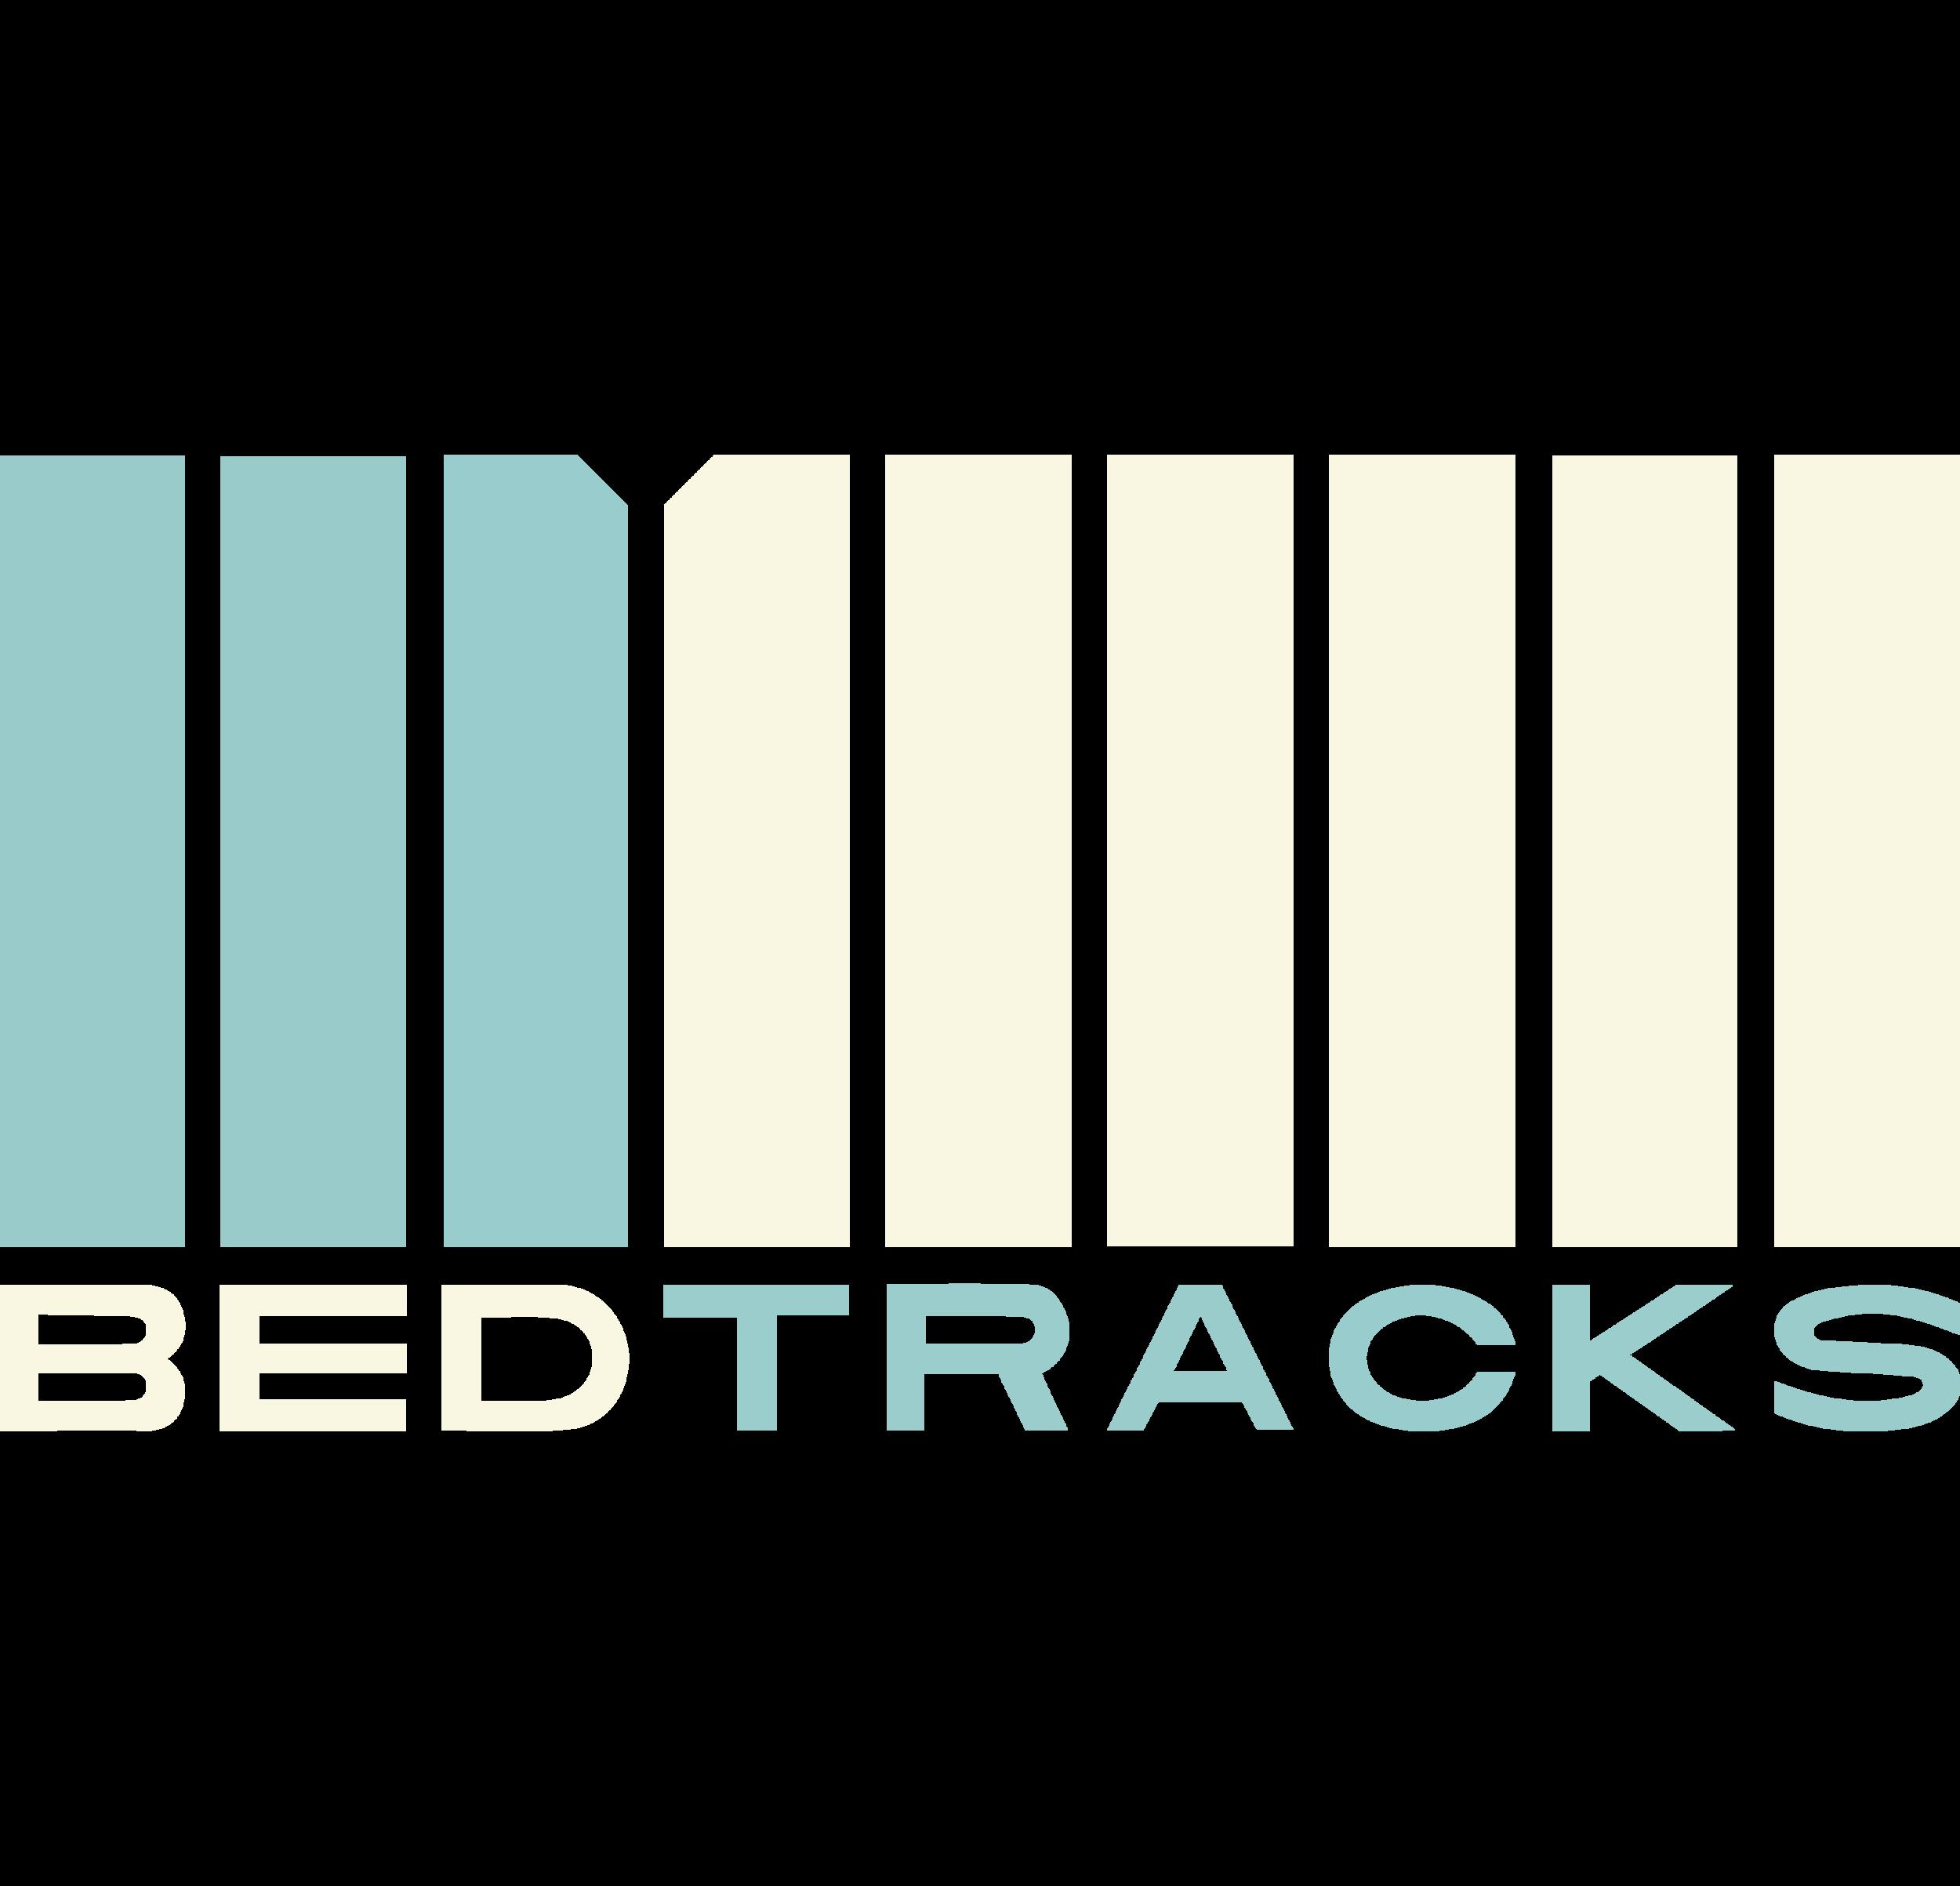 BedtracksLogo-Col2.png